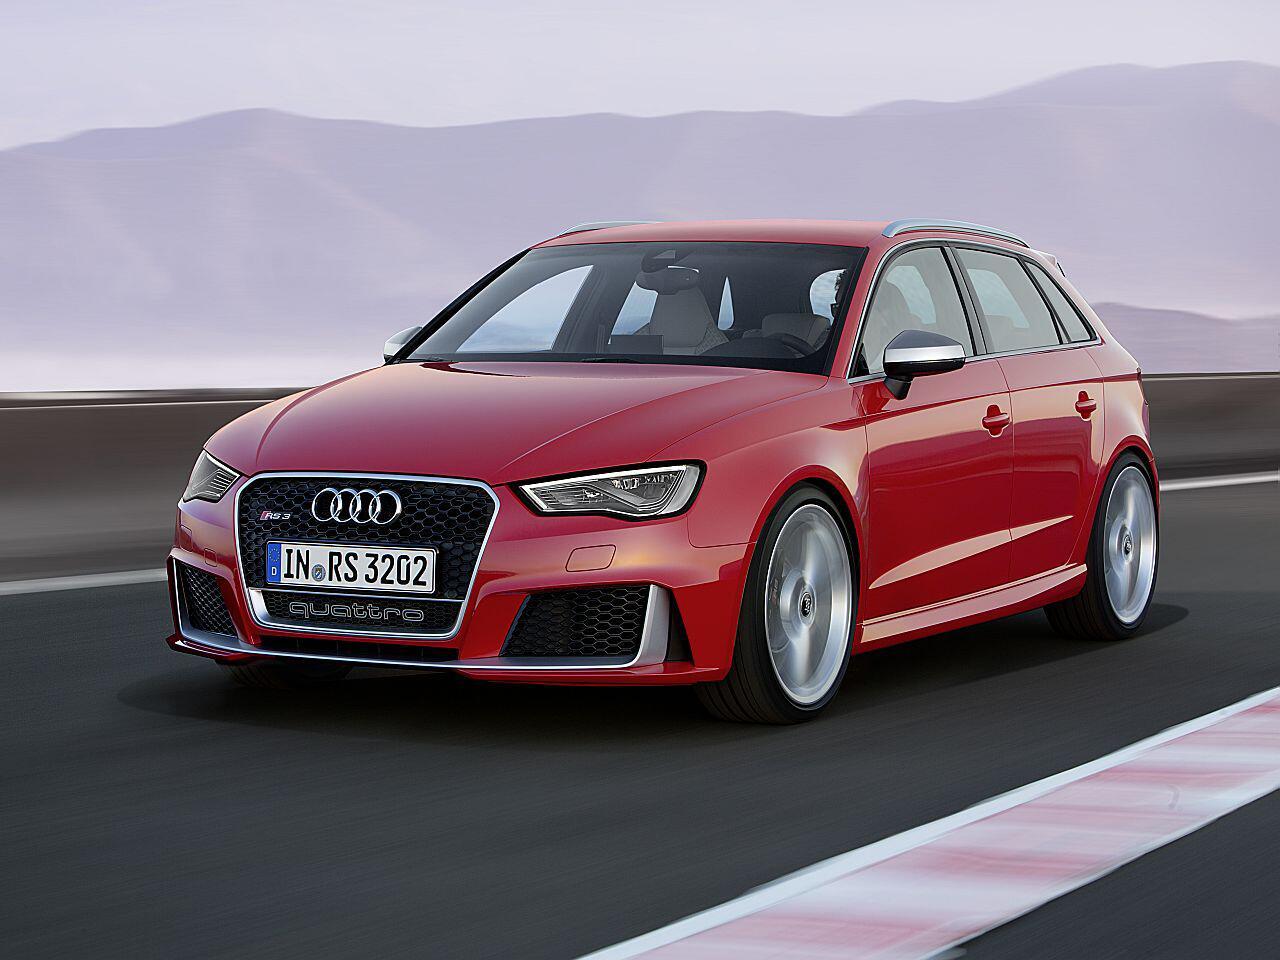 Bild zu 1. Platz: Audi RS 3 Sportback